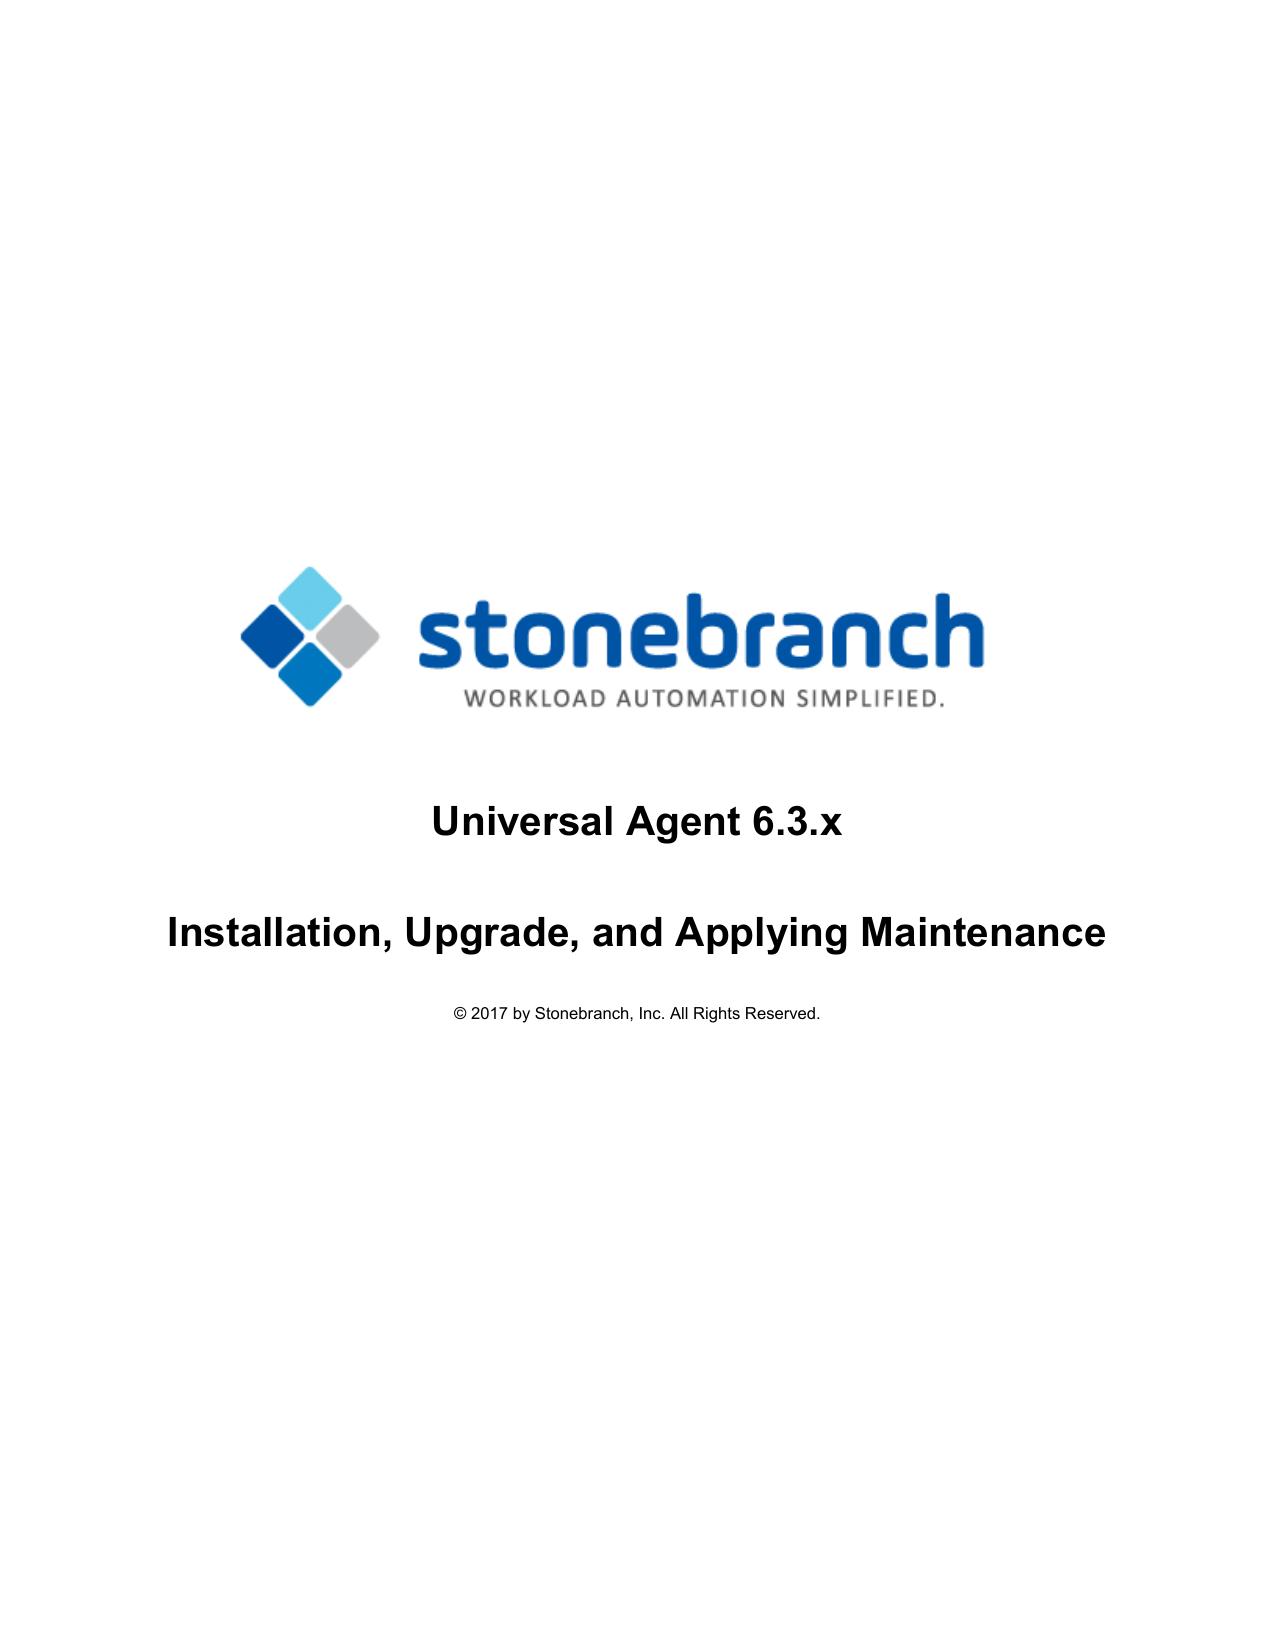 Universal Agent 6 3 x Installation, Upgrade, and   manualzz com